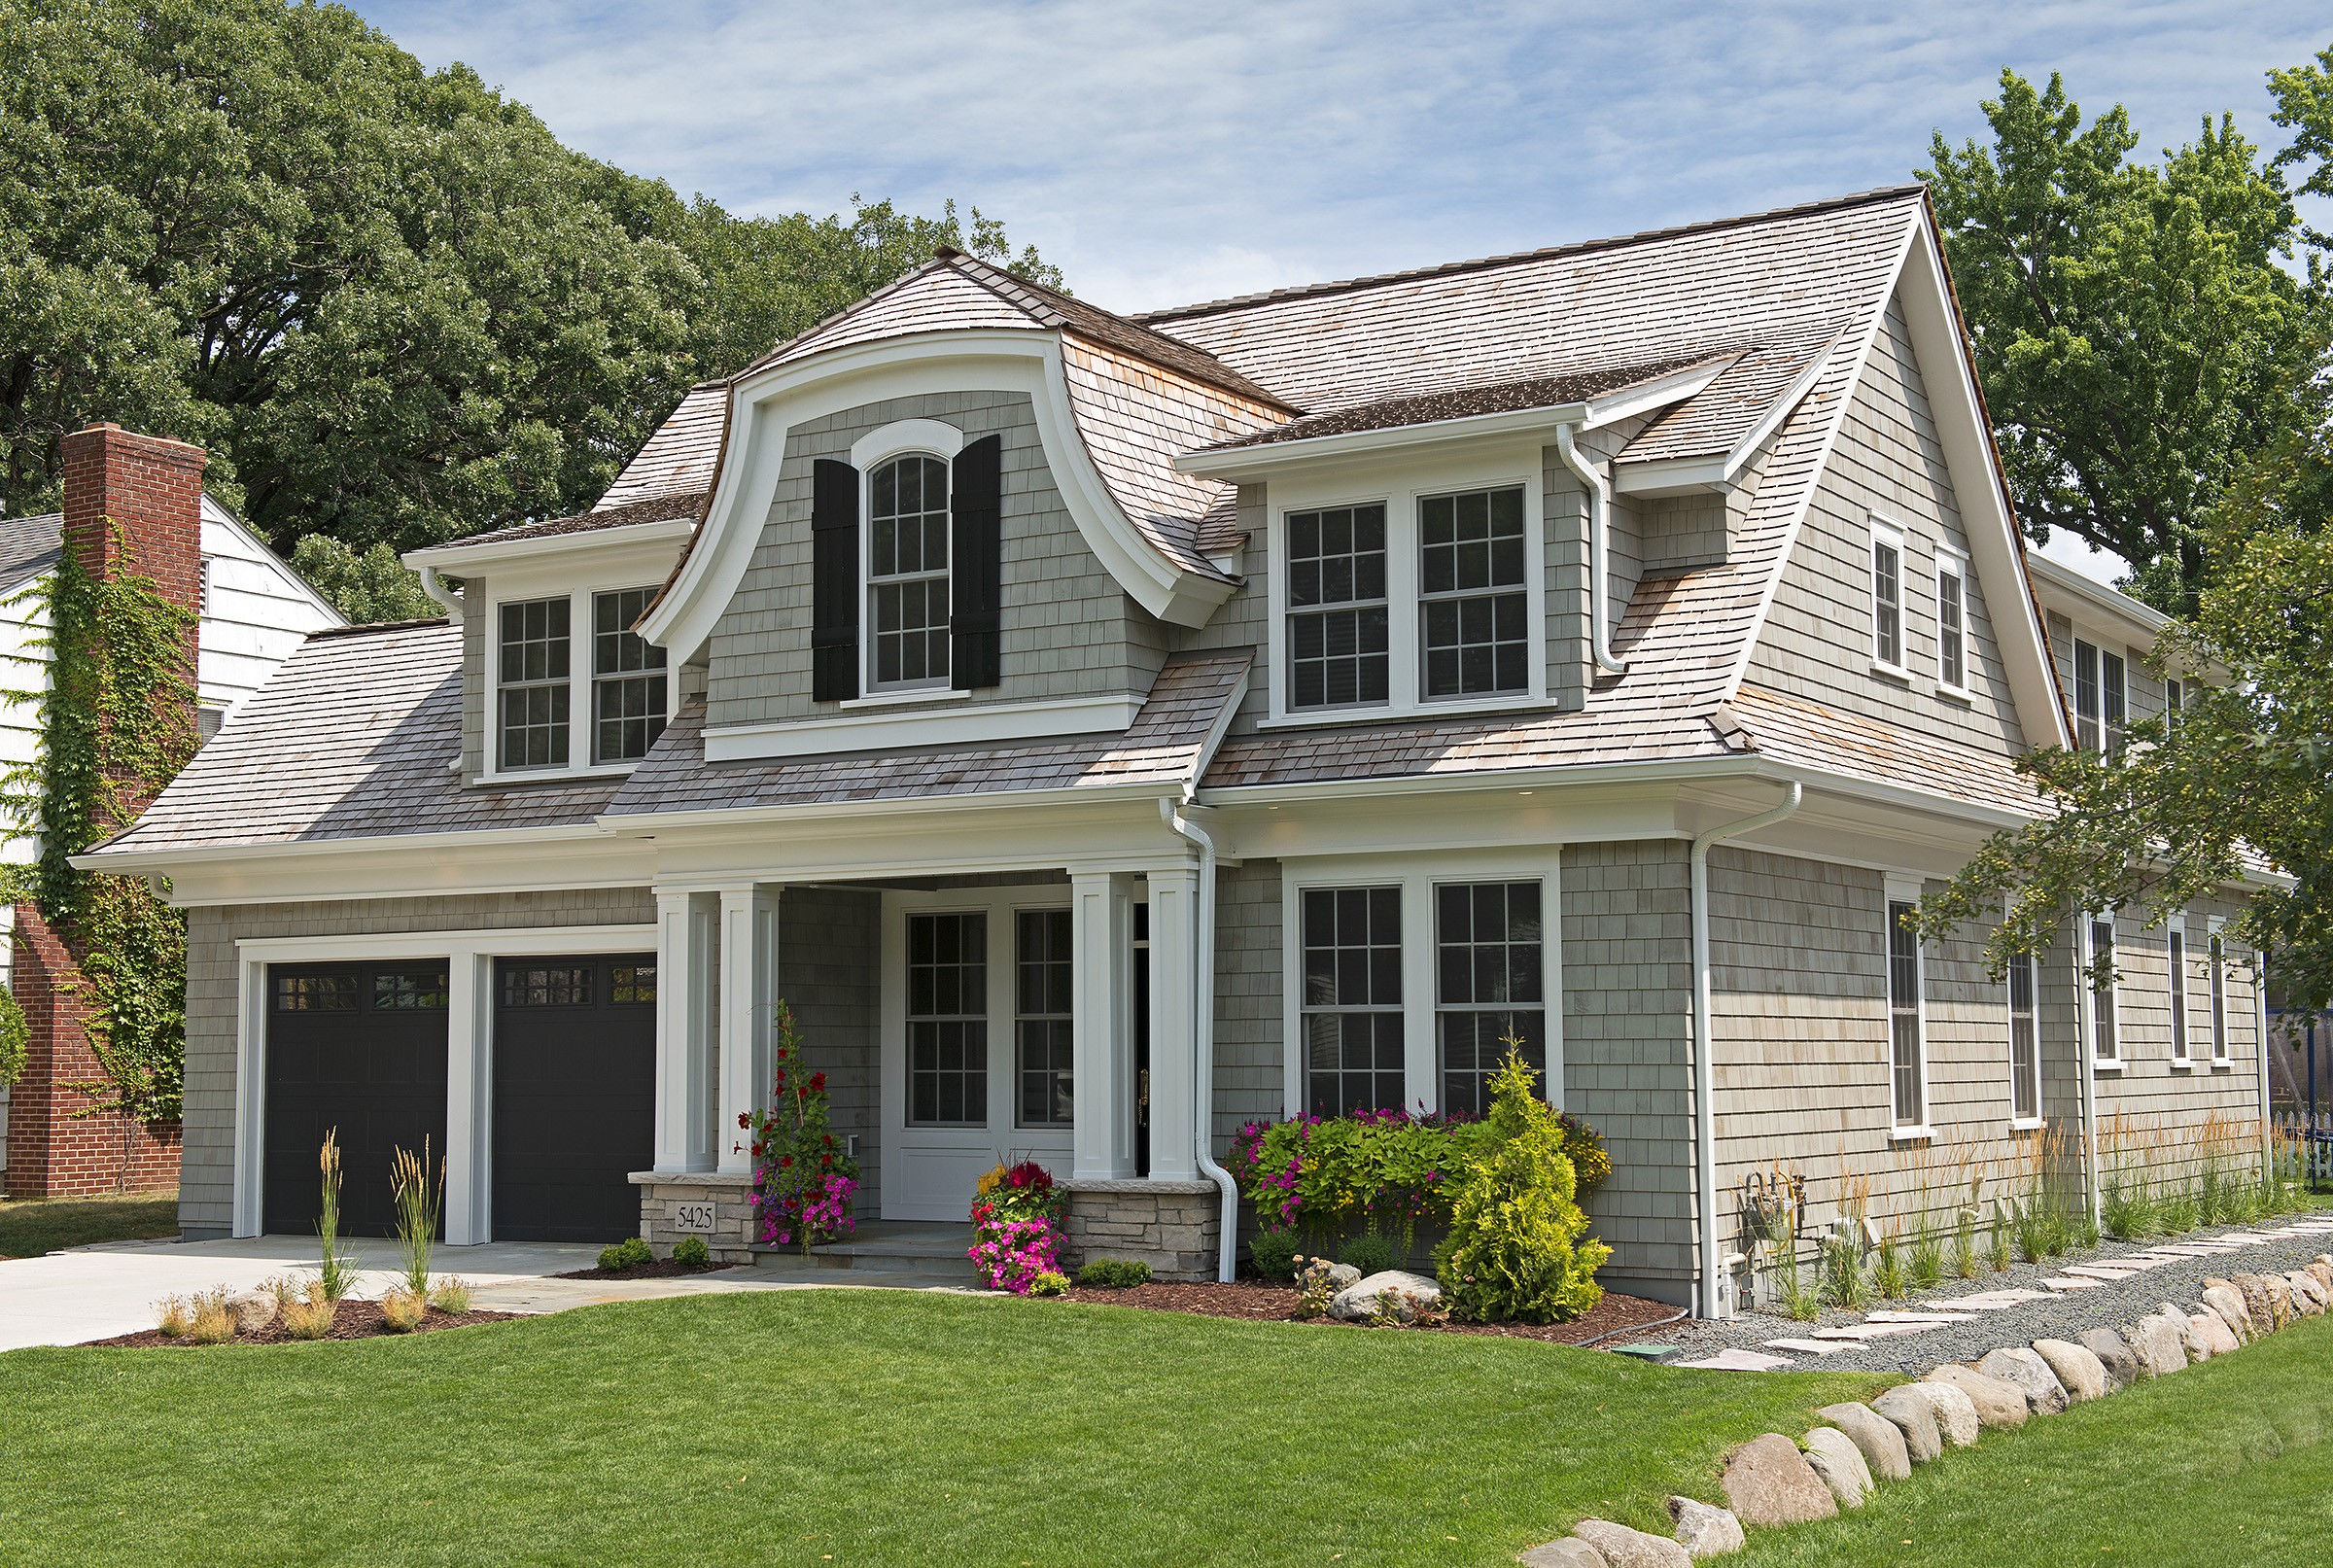 14 Photos And Inspiration Dutch Colonial Home  Home Plans  Blueprints